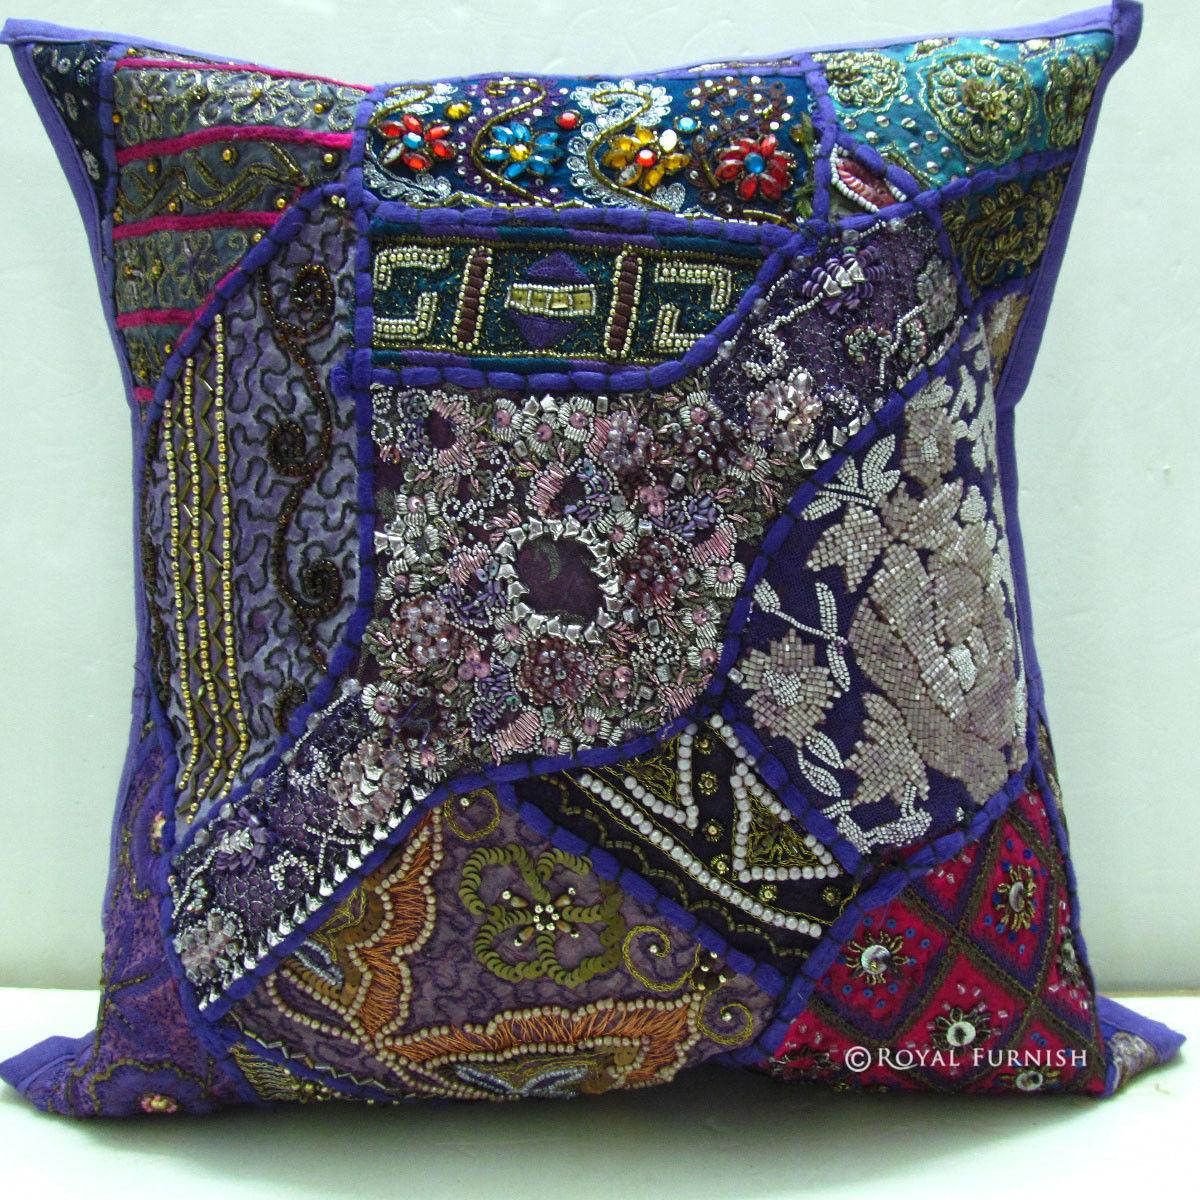 Purple Heavy Beaded Vintage India Patchwork Toss Pillow Sham - RoyalFurnish.com